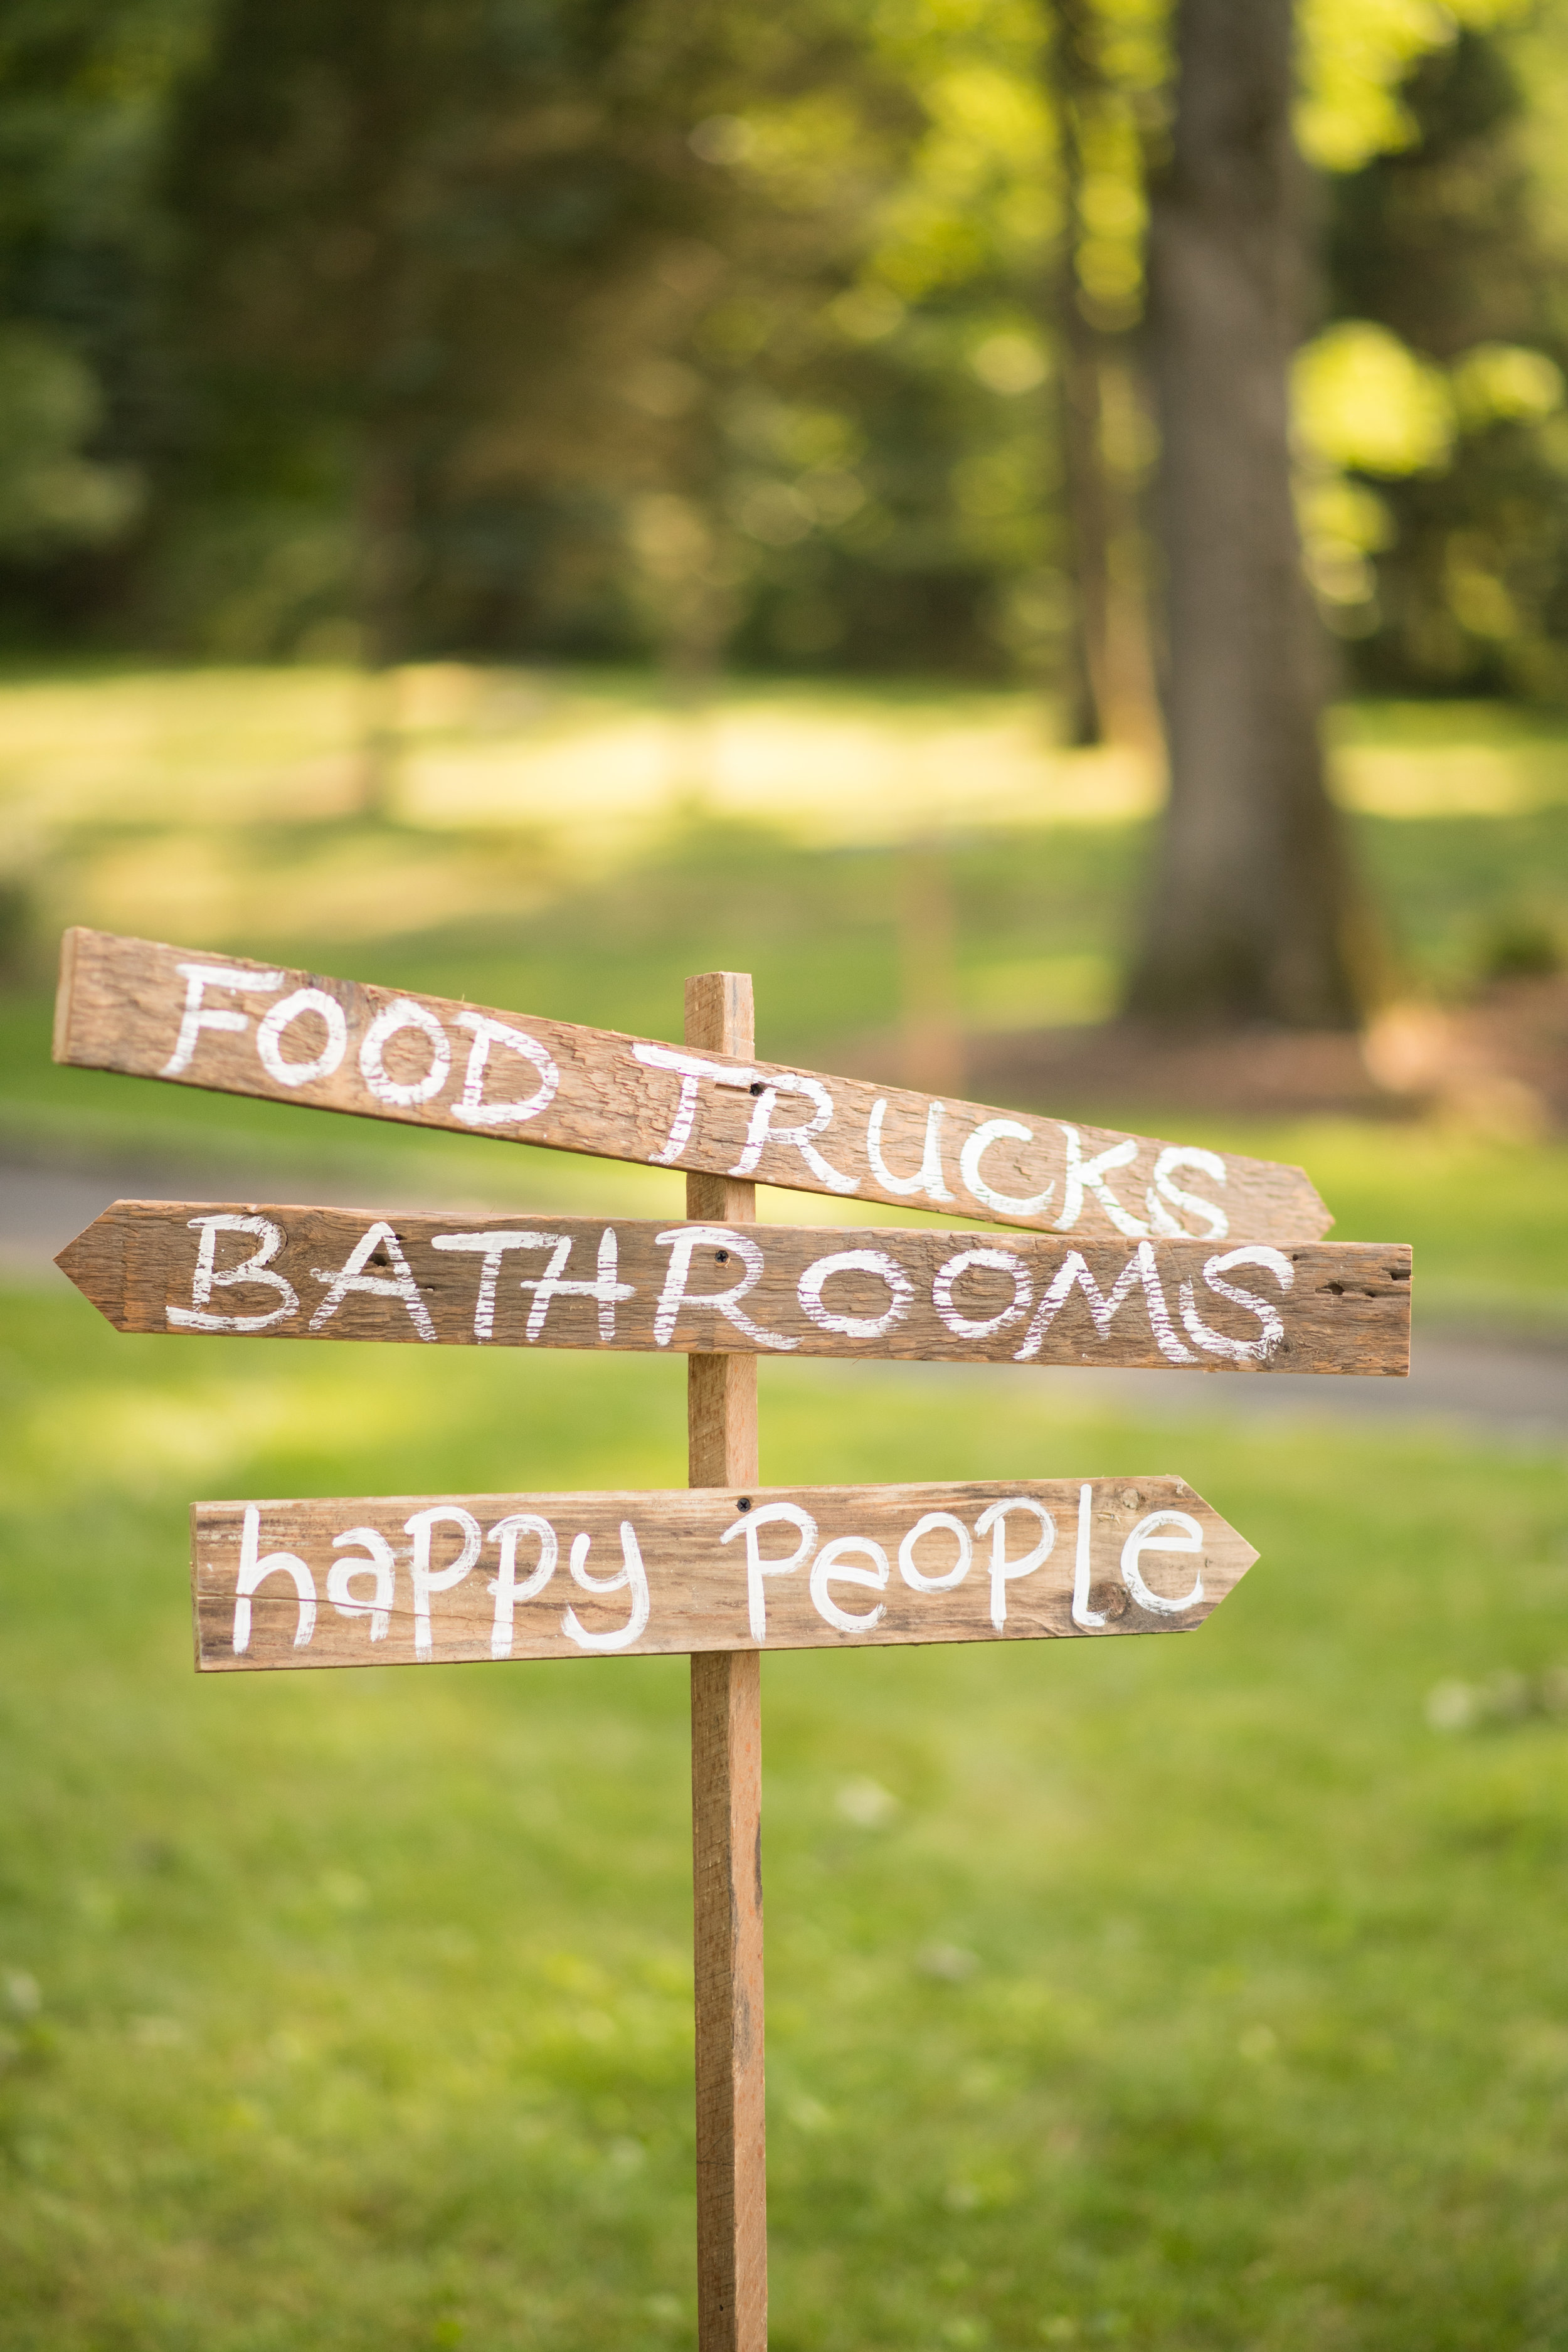 Clear Top Tent Food Truck Wedding Fairfield County CT006.jpg